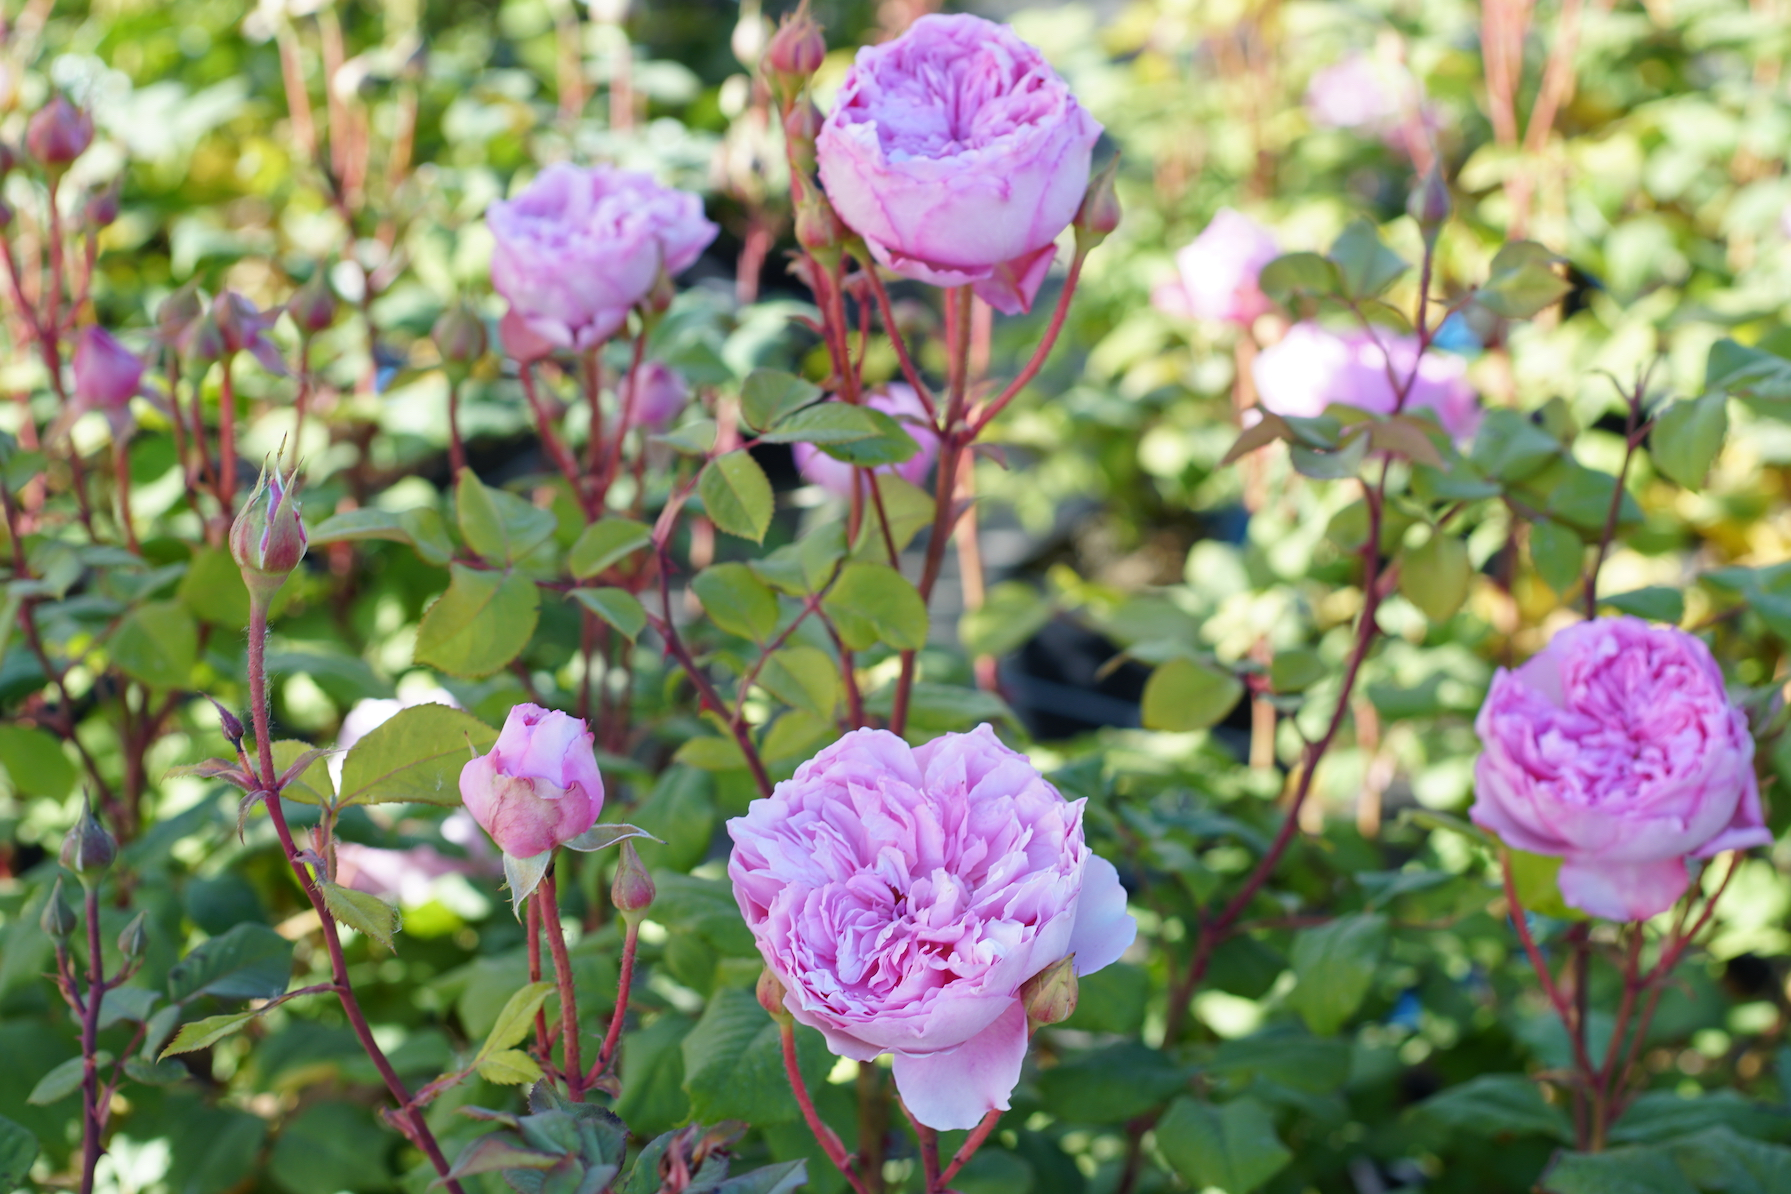 Rosier buisson Générosa® - Elodie Gossuin® - Roses Guillot®